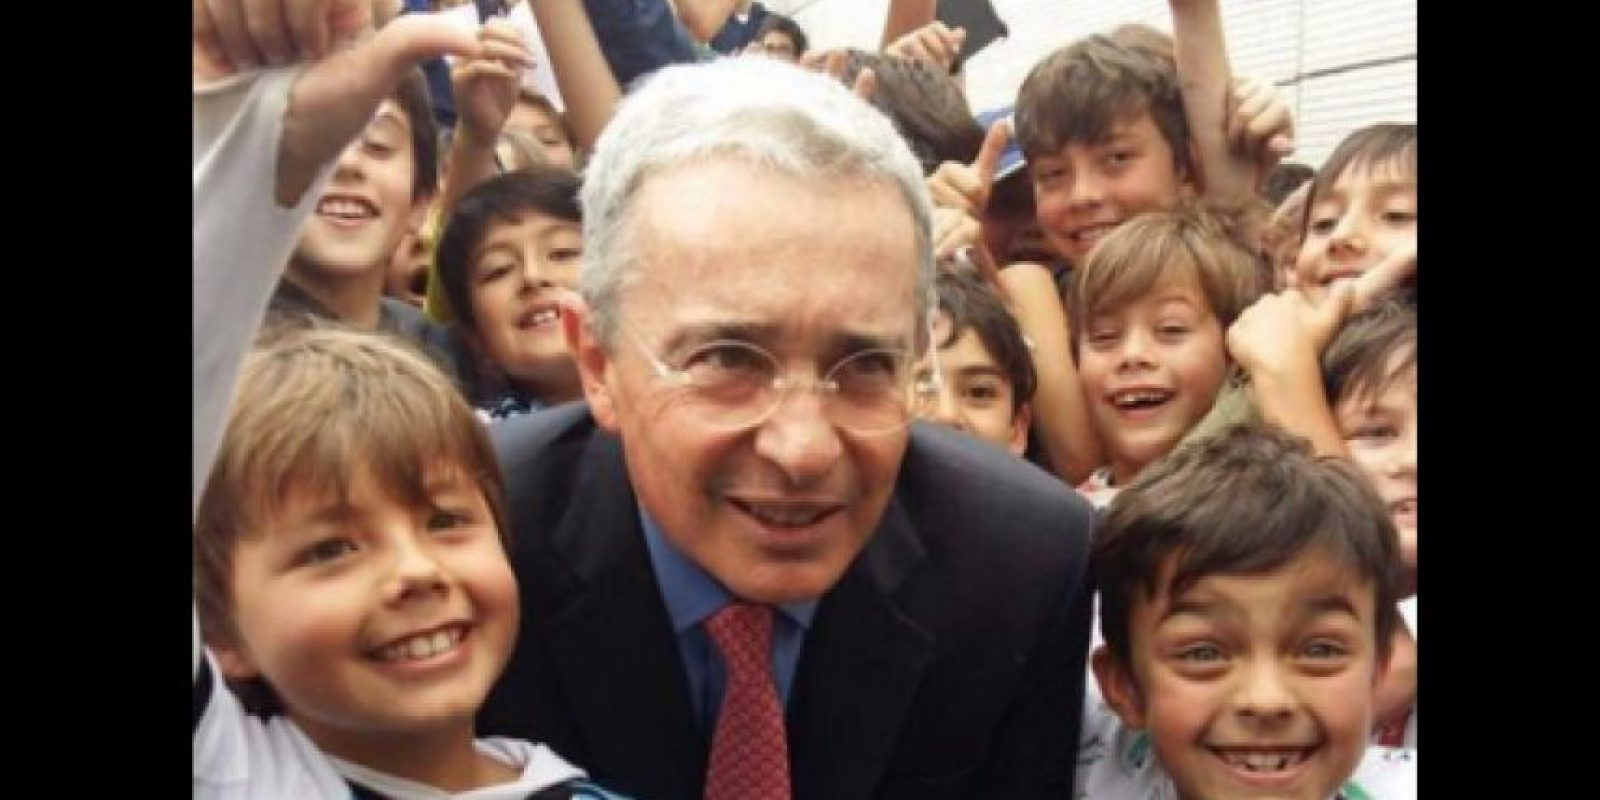 Visita de expresidente Álvaro Uribe al Gimnasio Campestre de Bogotá. Foto:Tomada de Twiiter @angelitabang